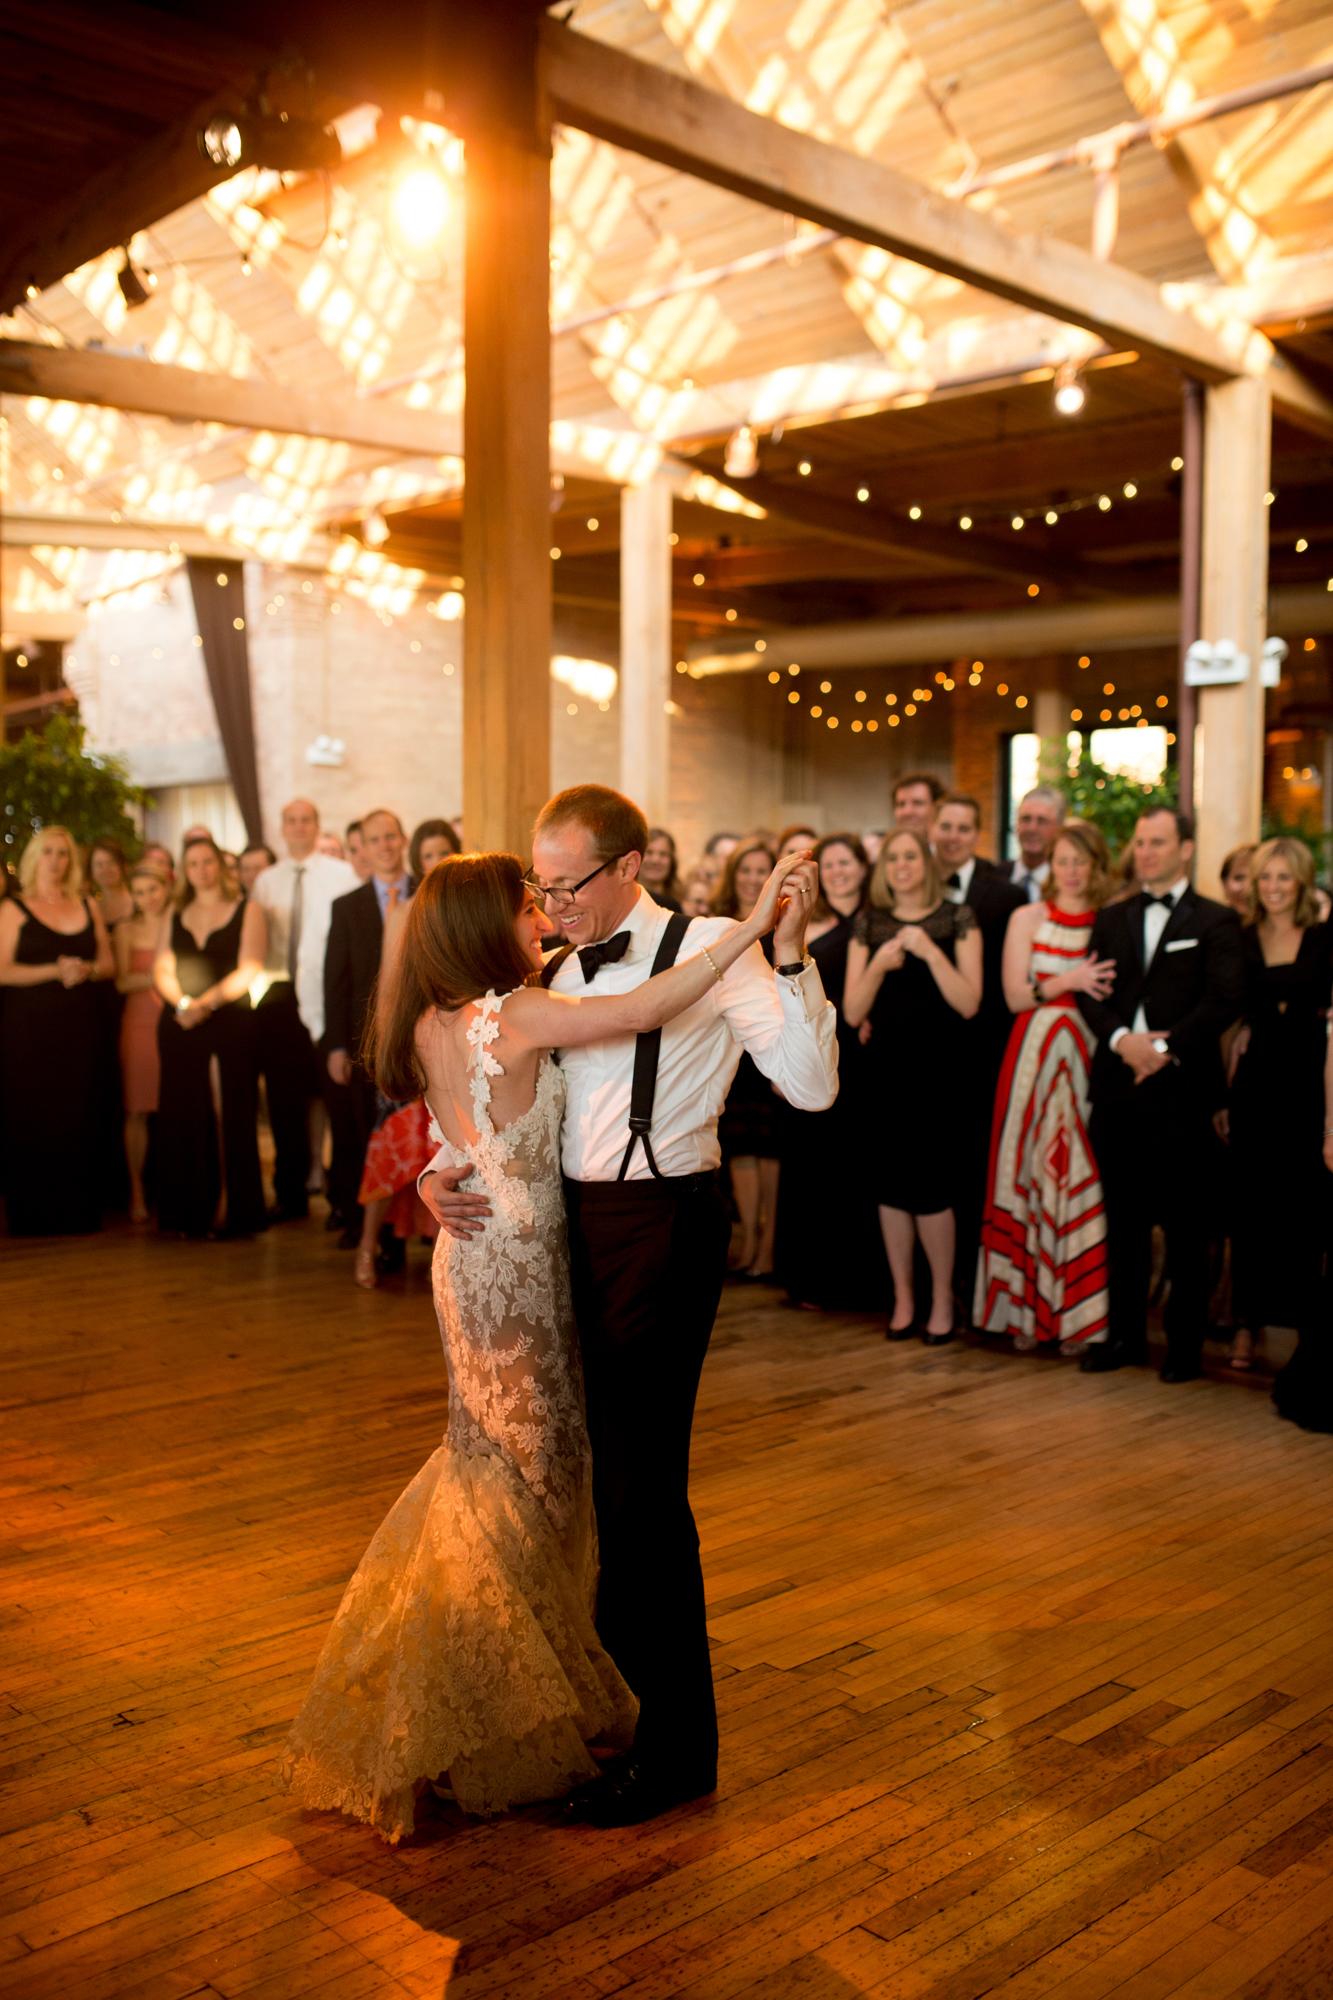 Bride and groom's first dance at Bridgeport Art Center Skyline Loft.